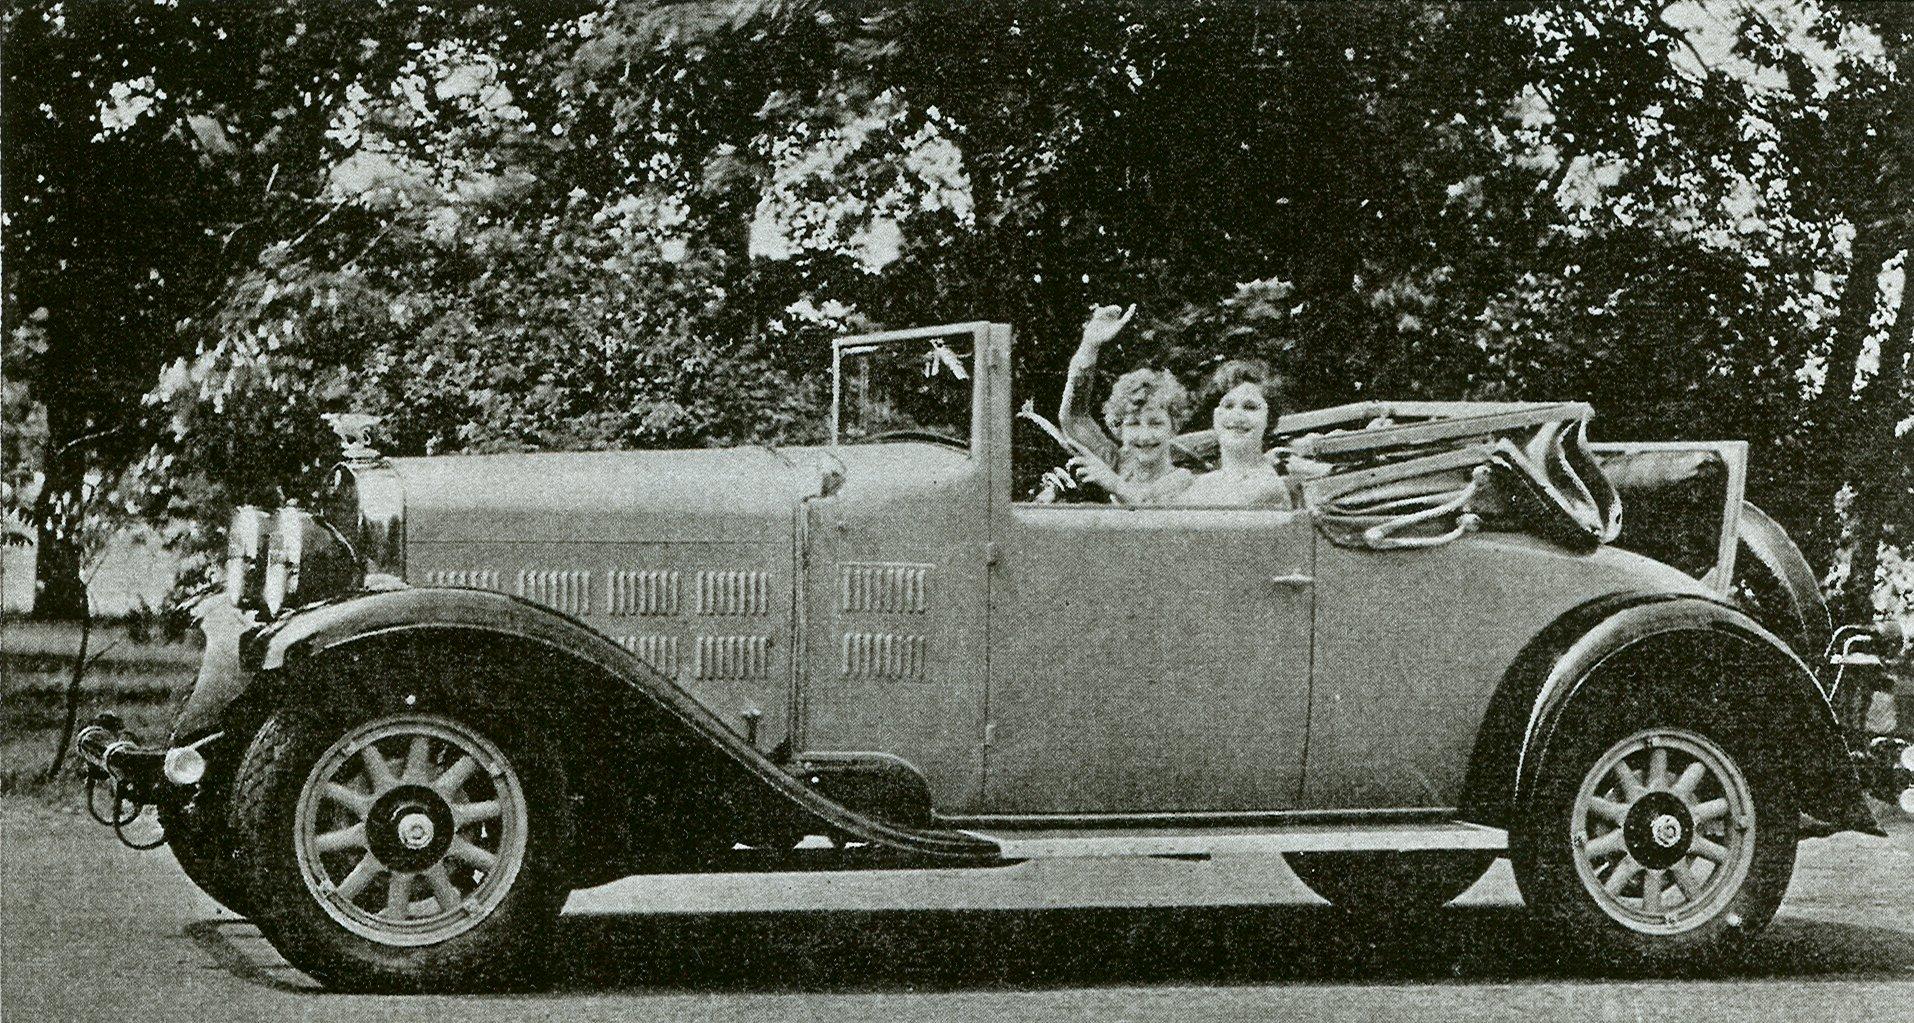 http://www.gardnermotorcars.com/images/1928_Custom-Coupe2-p.jpg